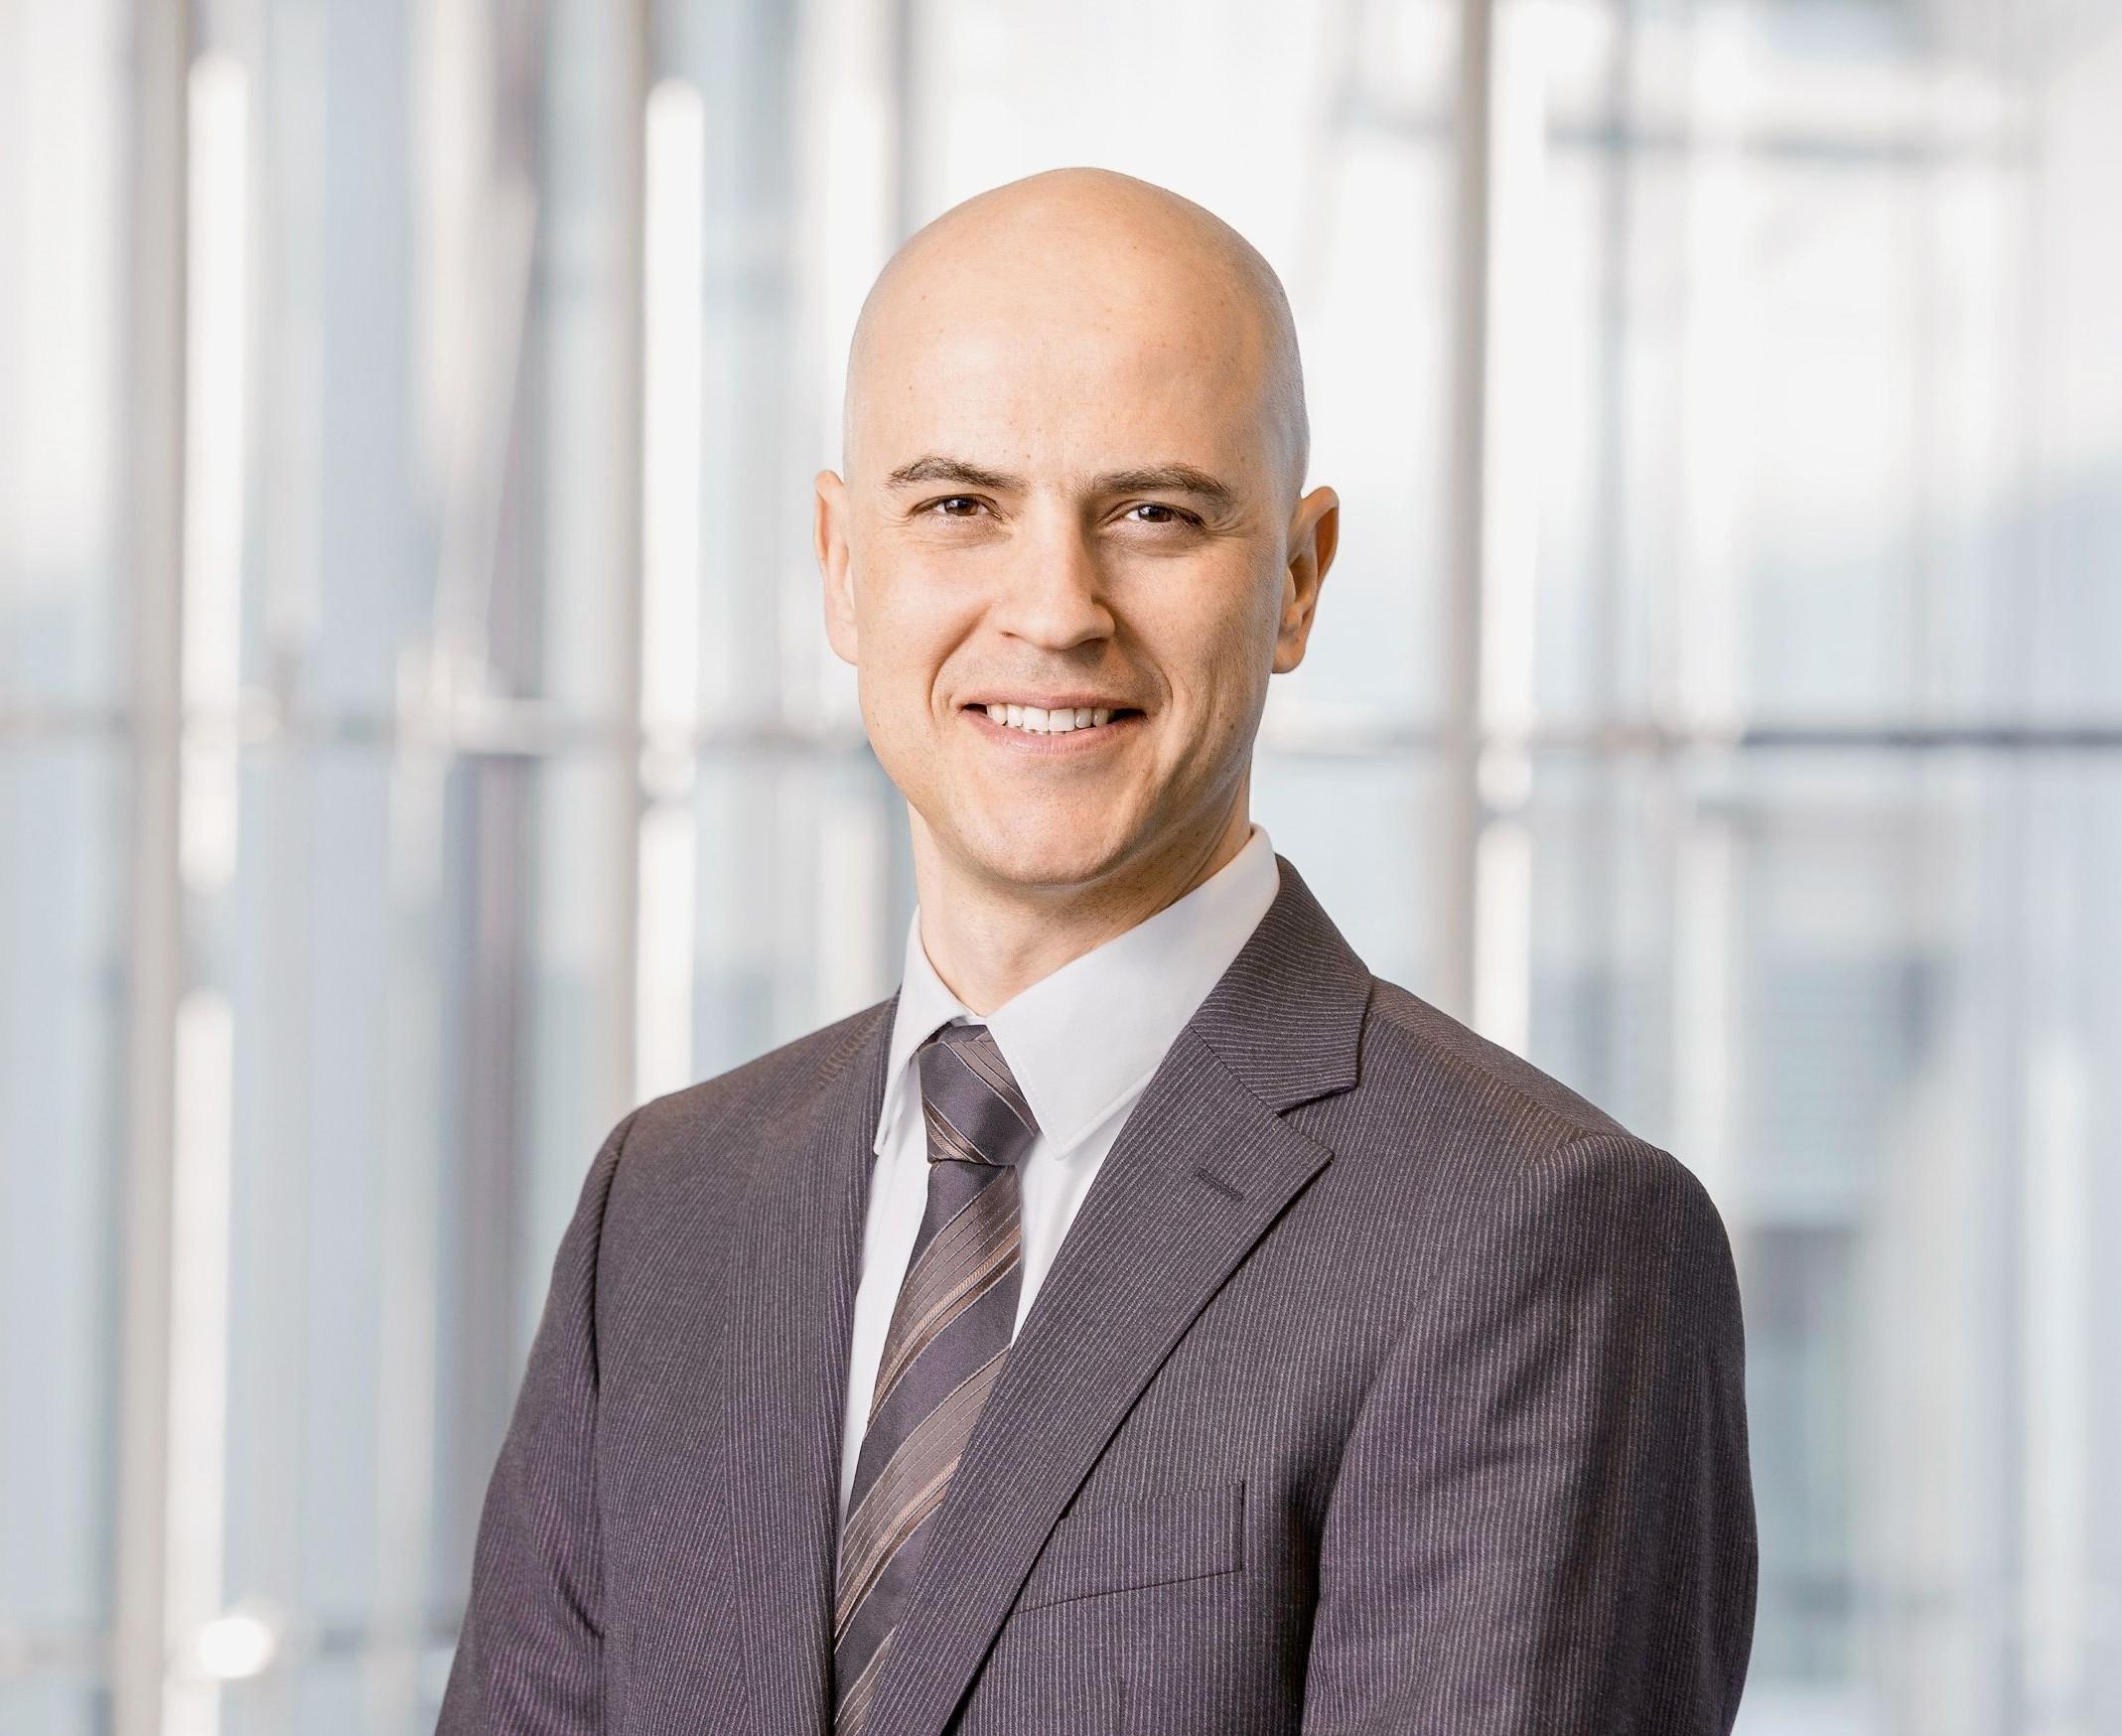 Claudio Saputelli, Leiter Swiss & Global Real Estate der UBS Switzerland AG